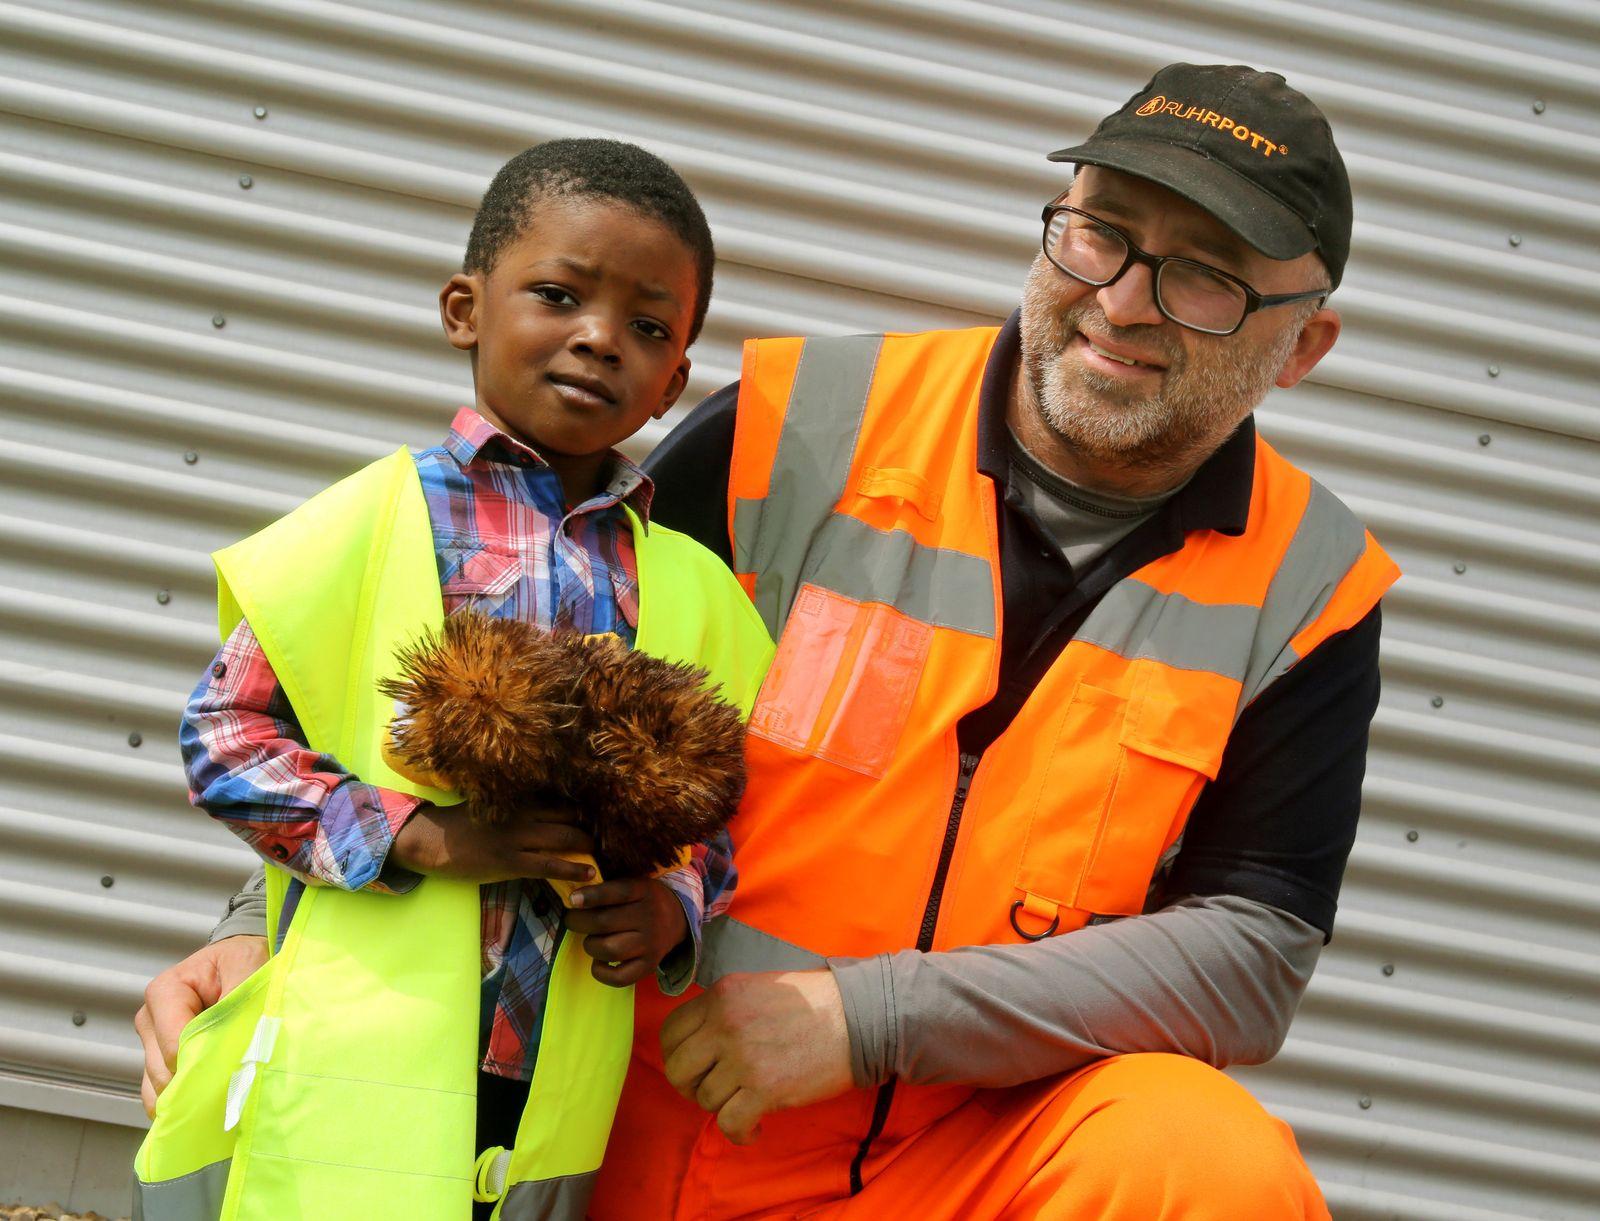 Müllmann rettet Kind